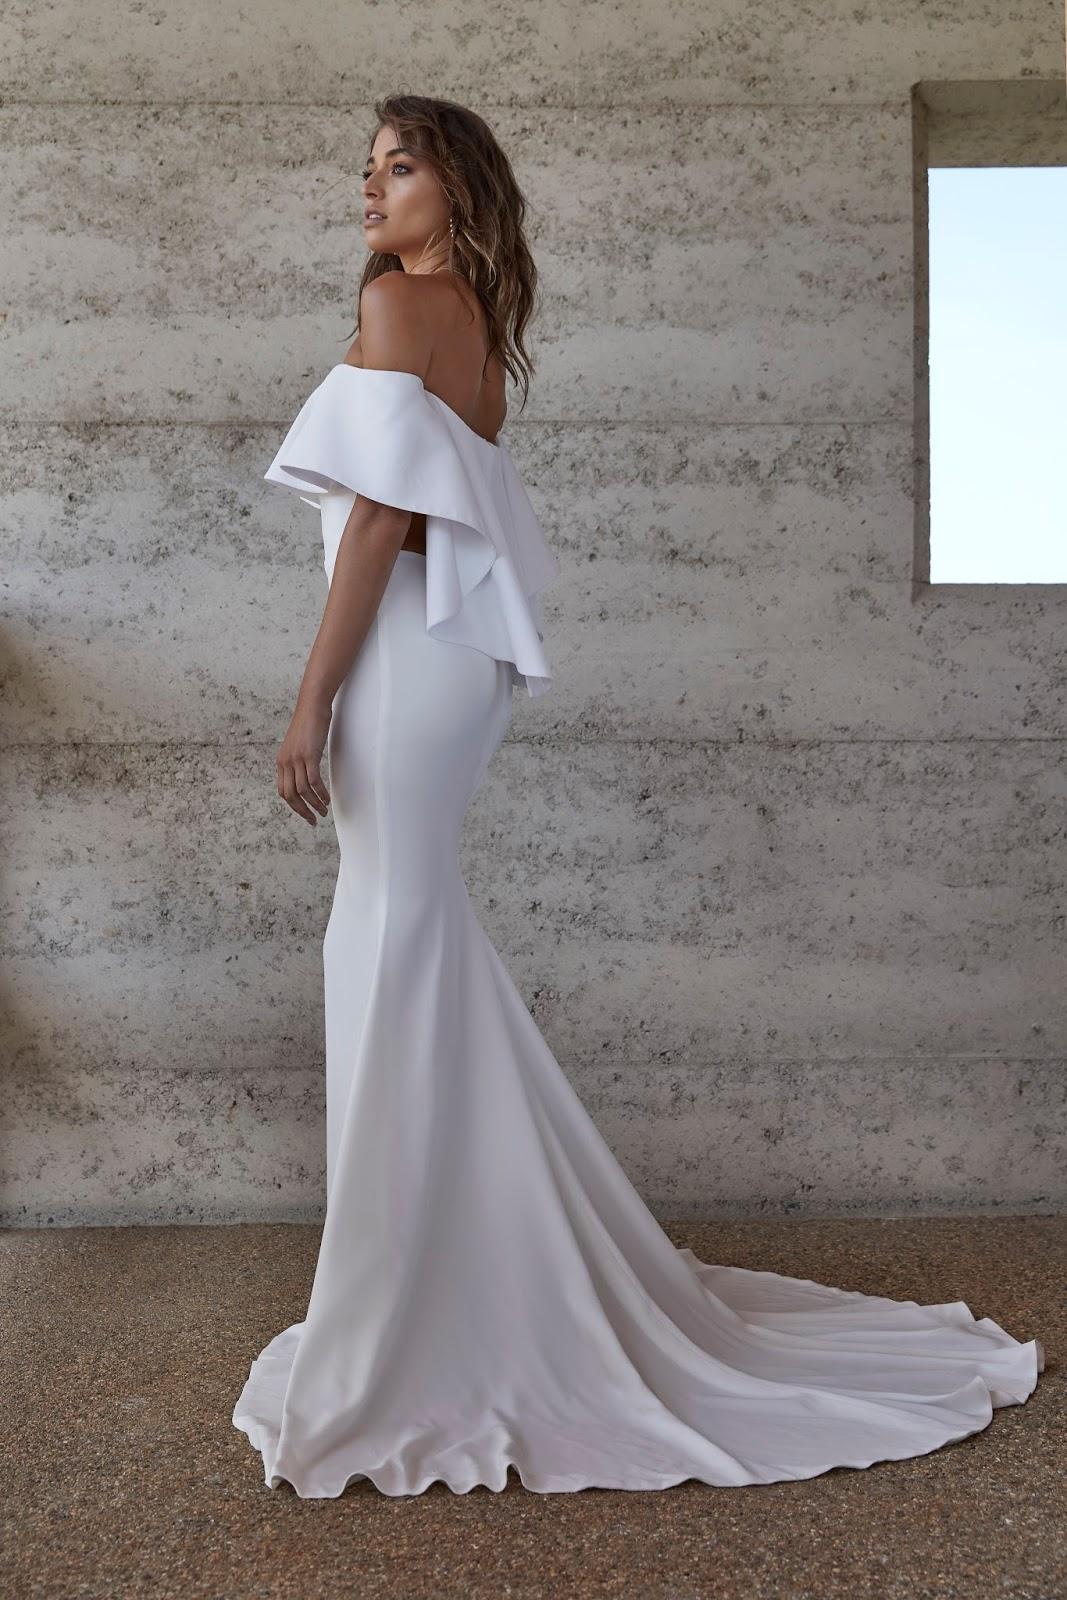 Reign Wedding Dress | Chosen By One Day New Reign Bridal Editor